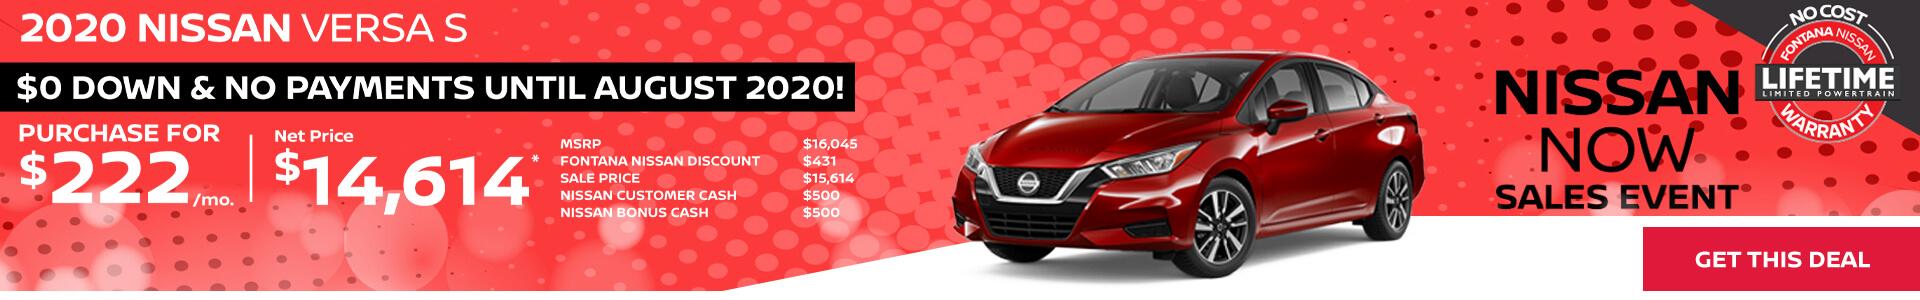 Nissan Versa $222